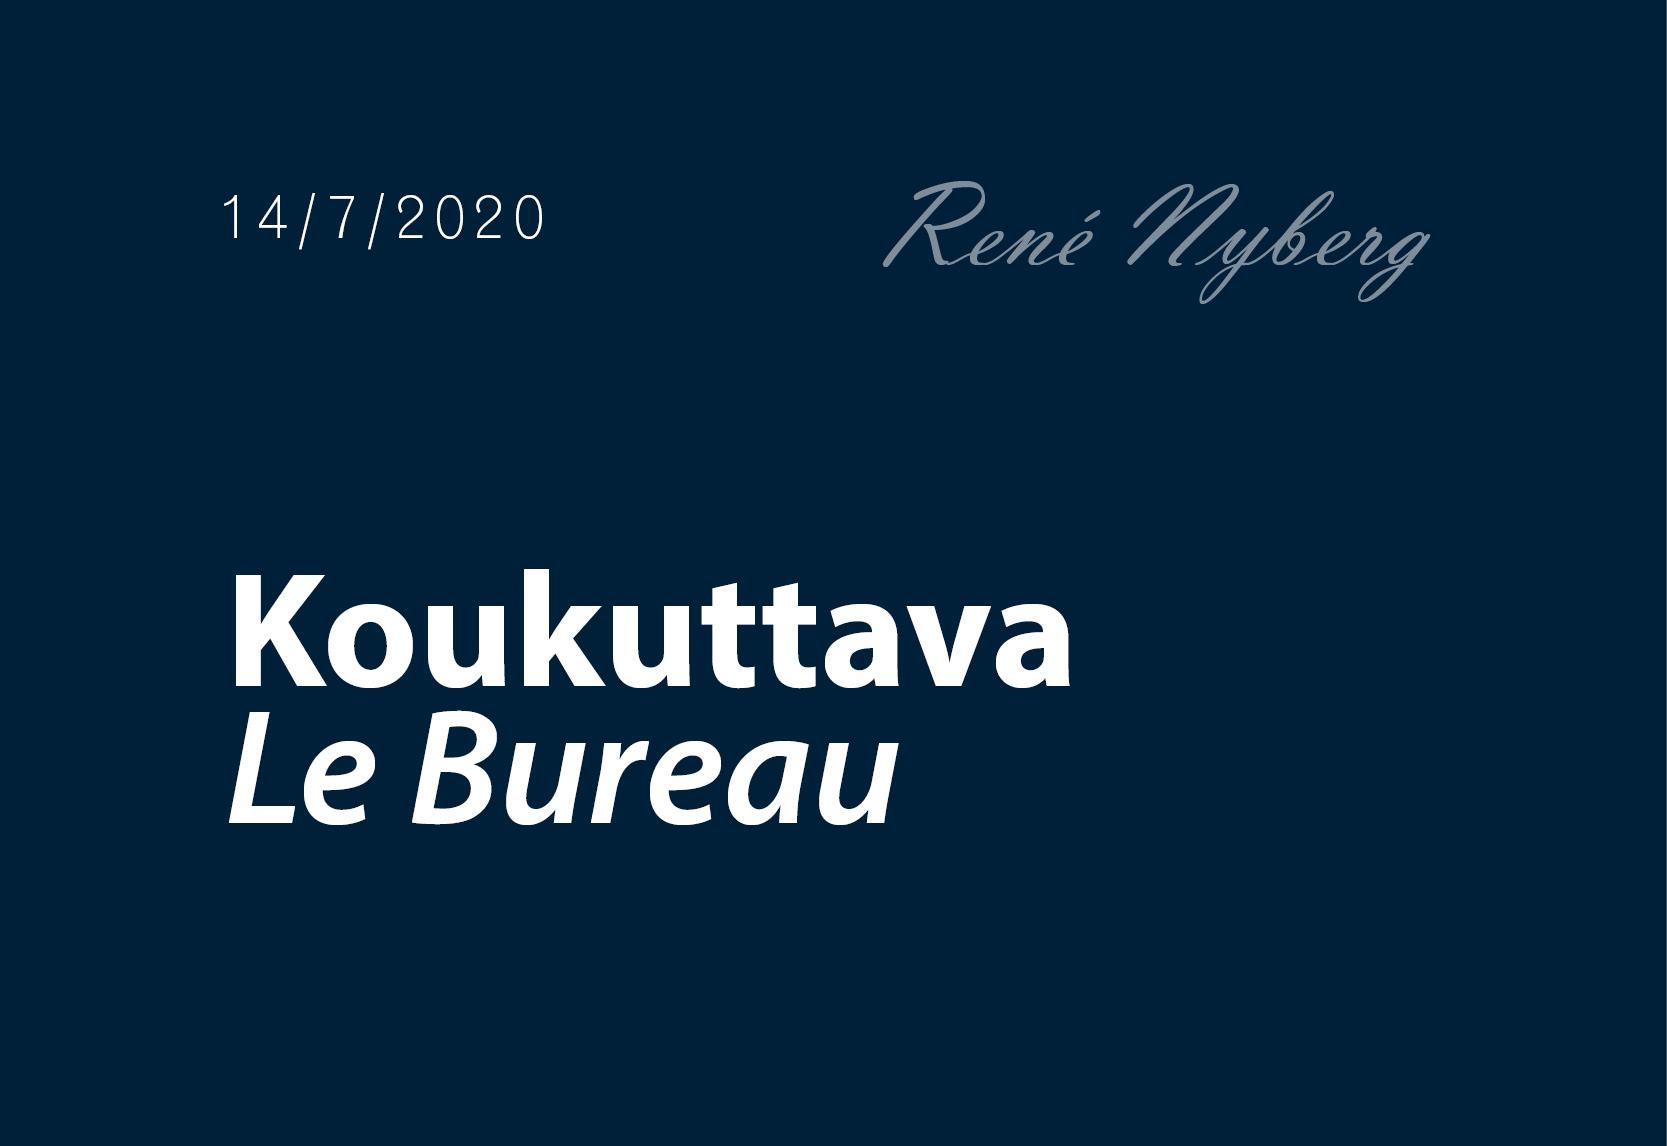 Koukuttava Le Bureau